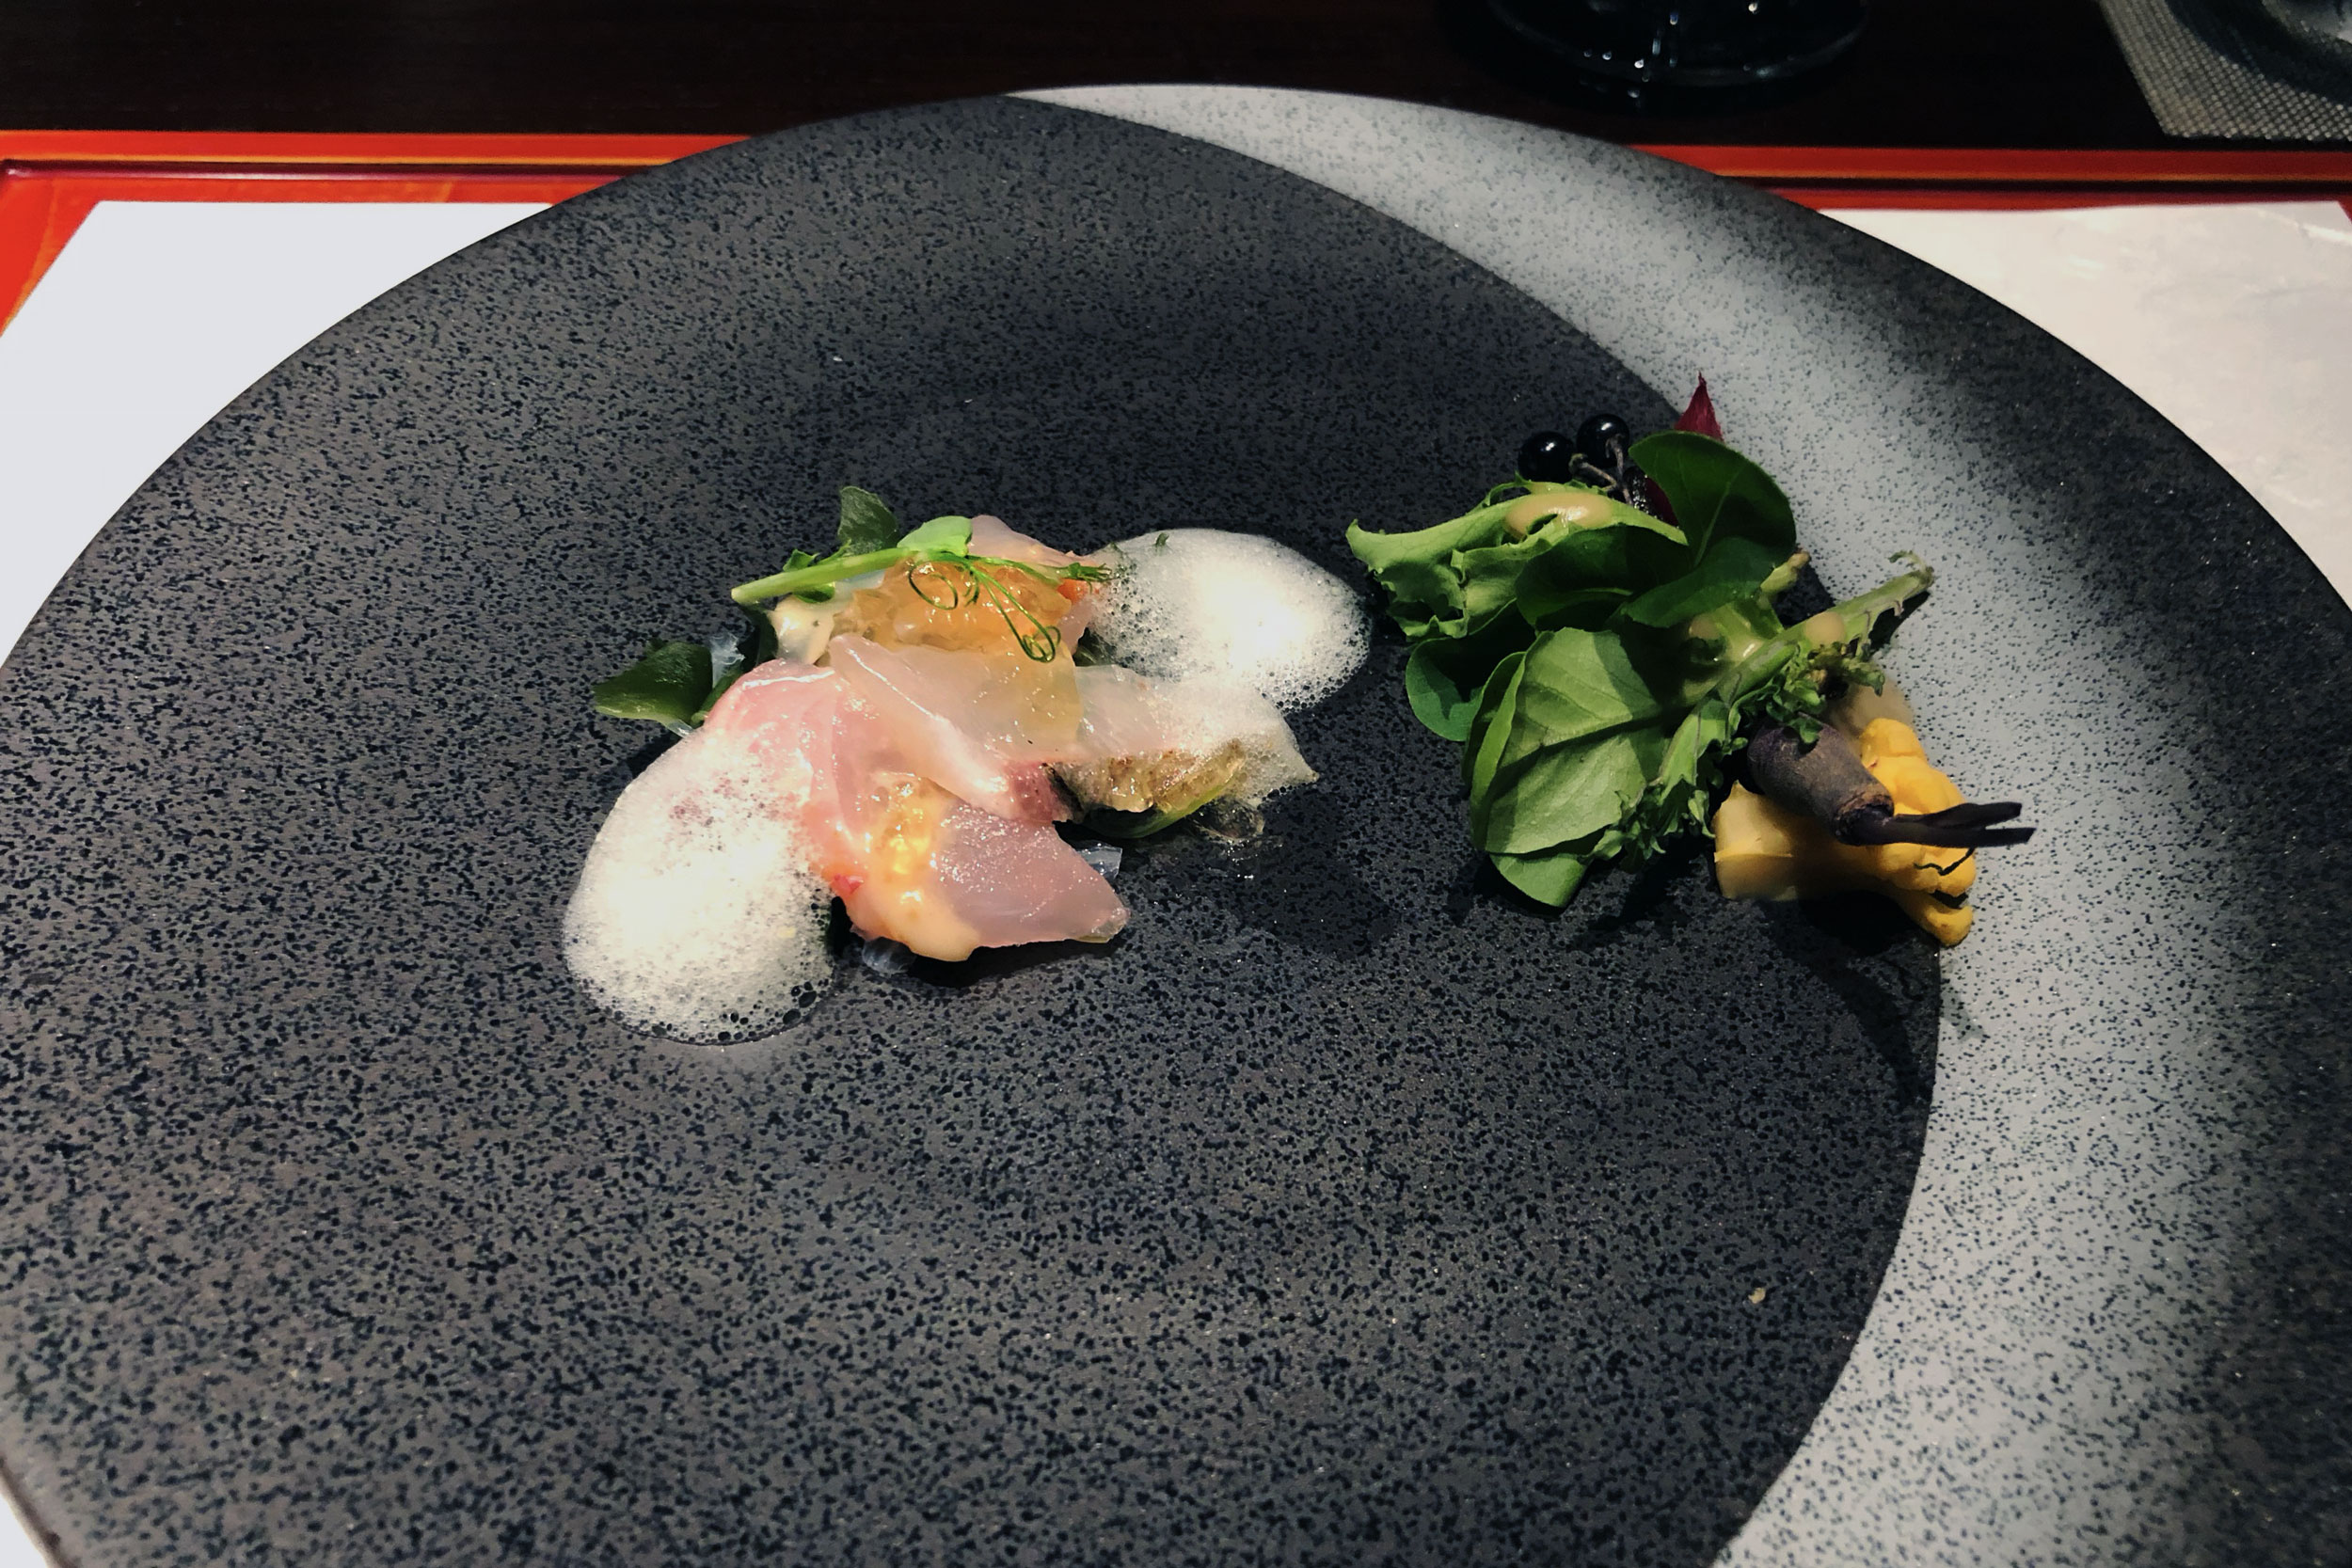 Sashimi (3 types) over seaweed salad, amaebi (sweet shrimp) jelly and wasabi foam with a mini garden salad and miso sesame paste